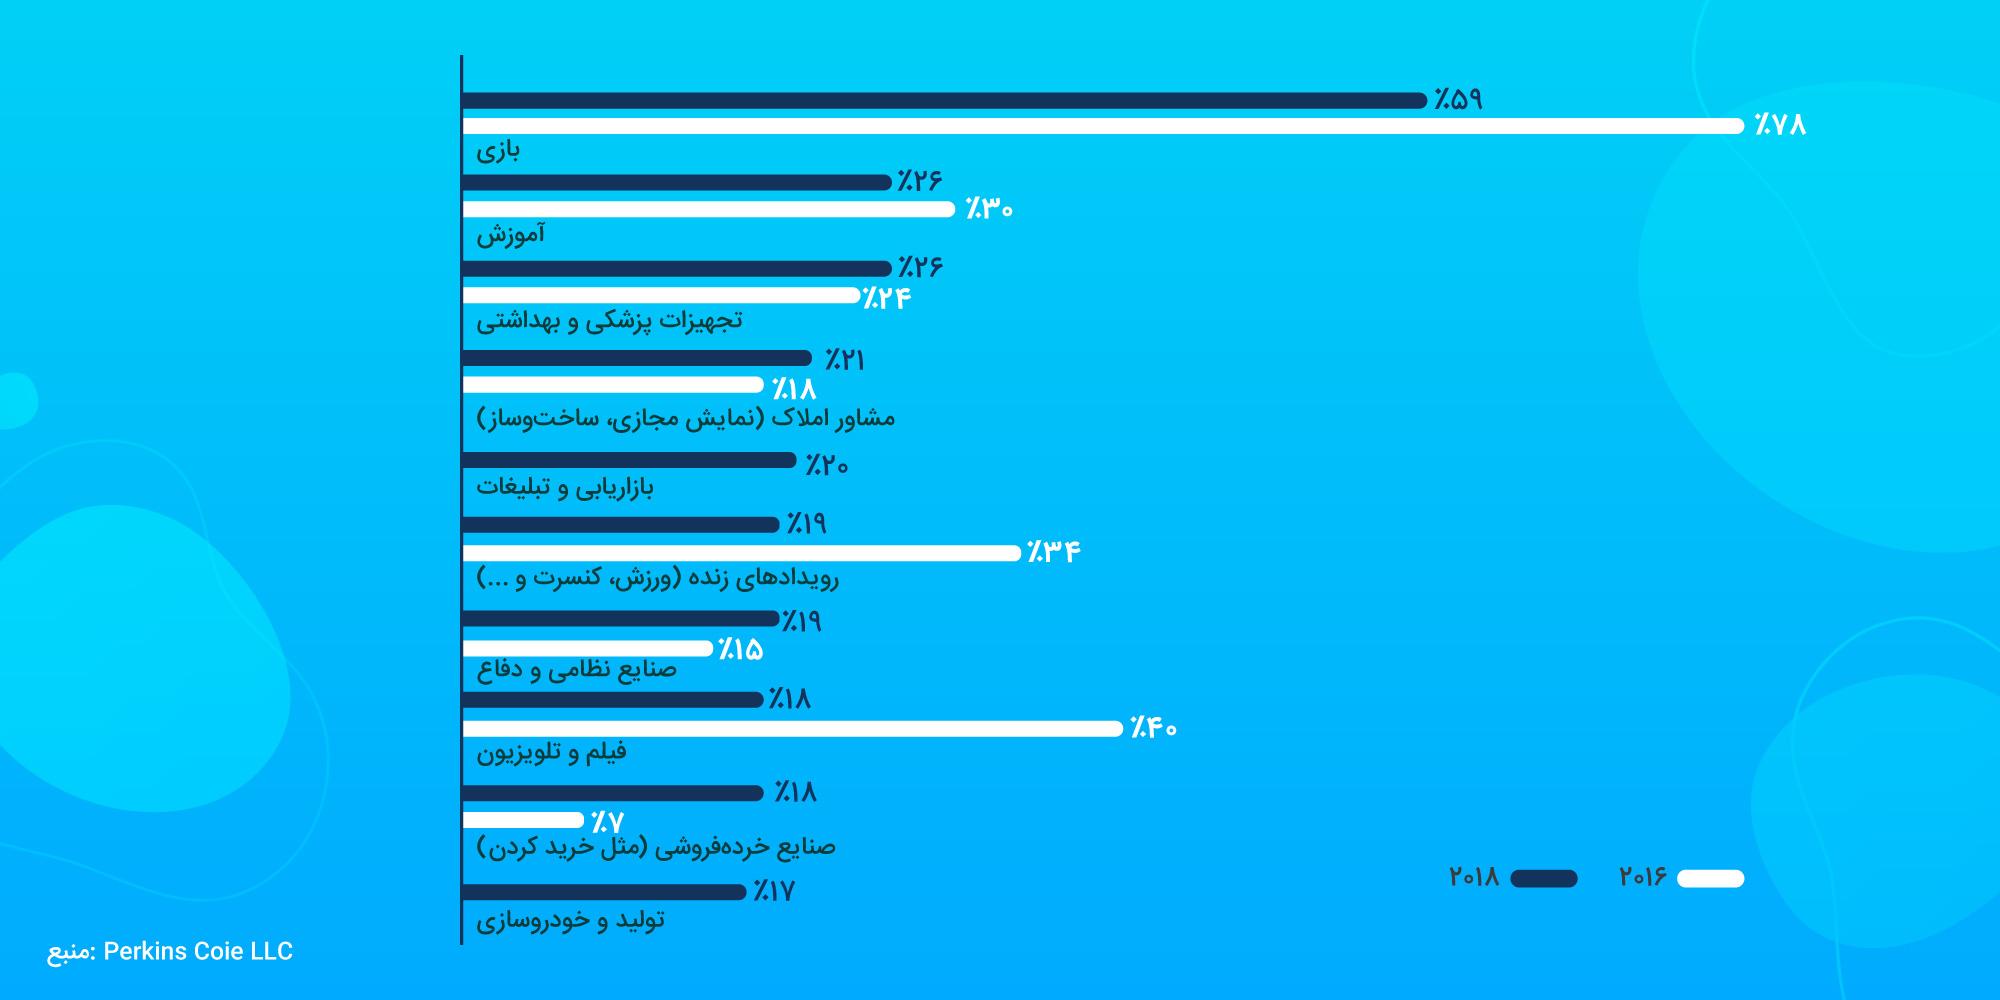 آمار بازاریابی بصری